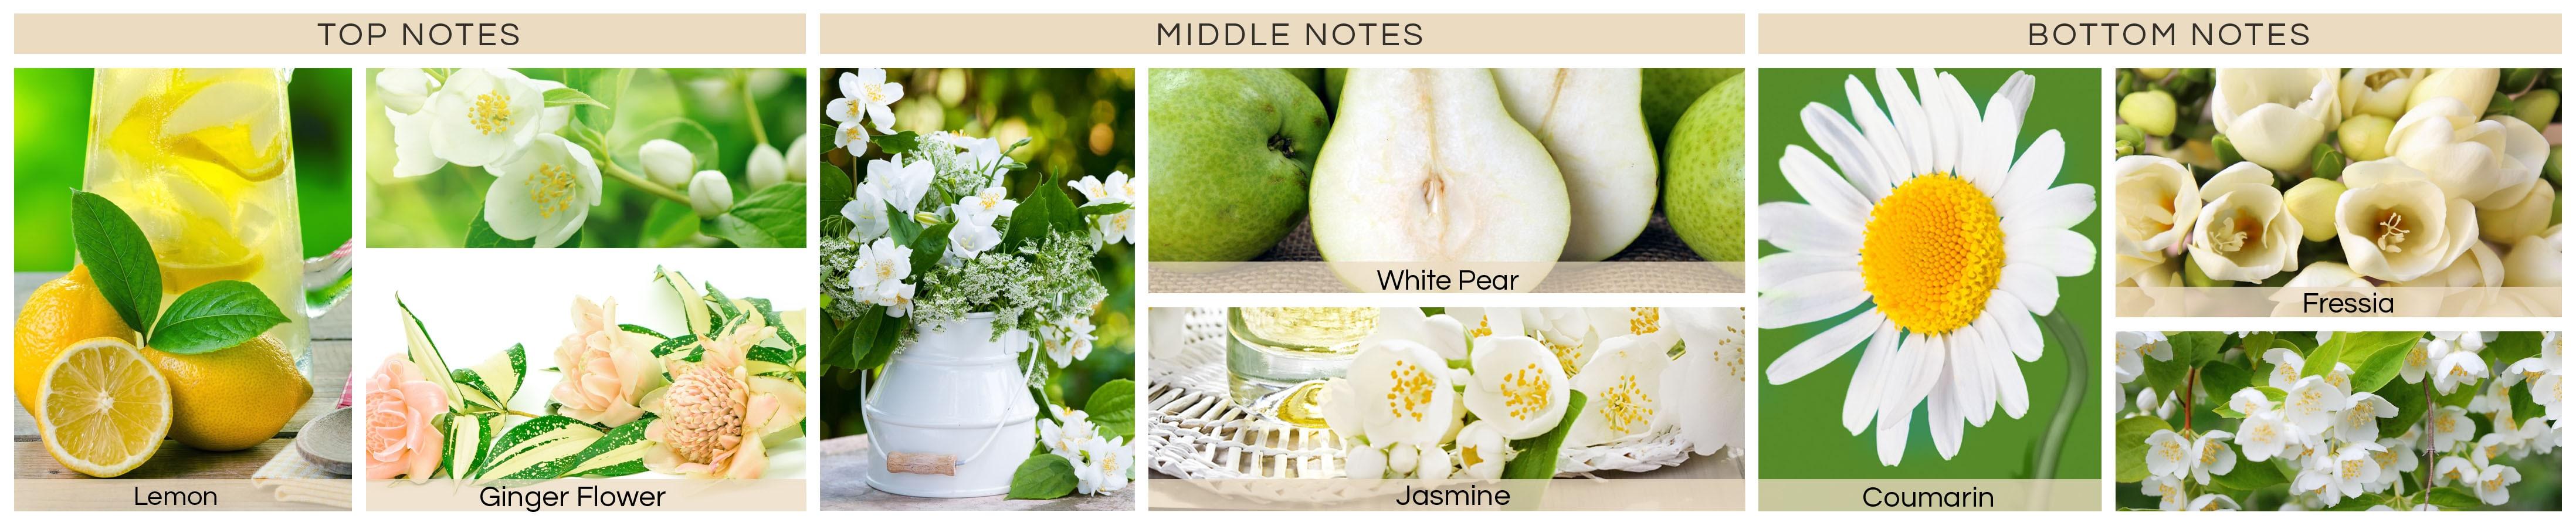 white-jasmine-and-fr576030ebd1807-min